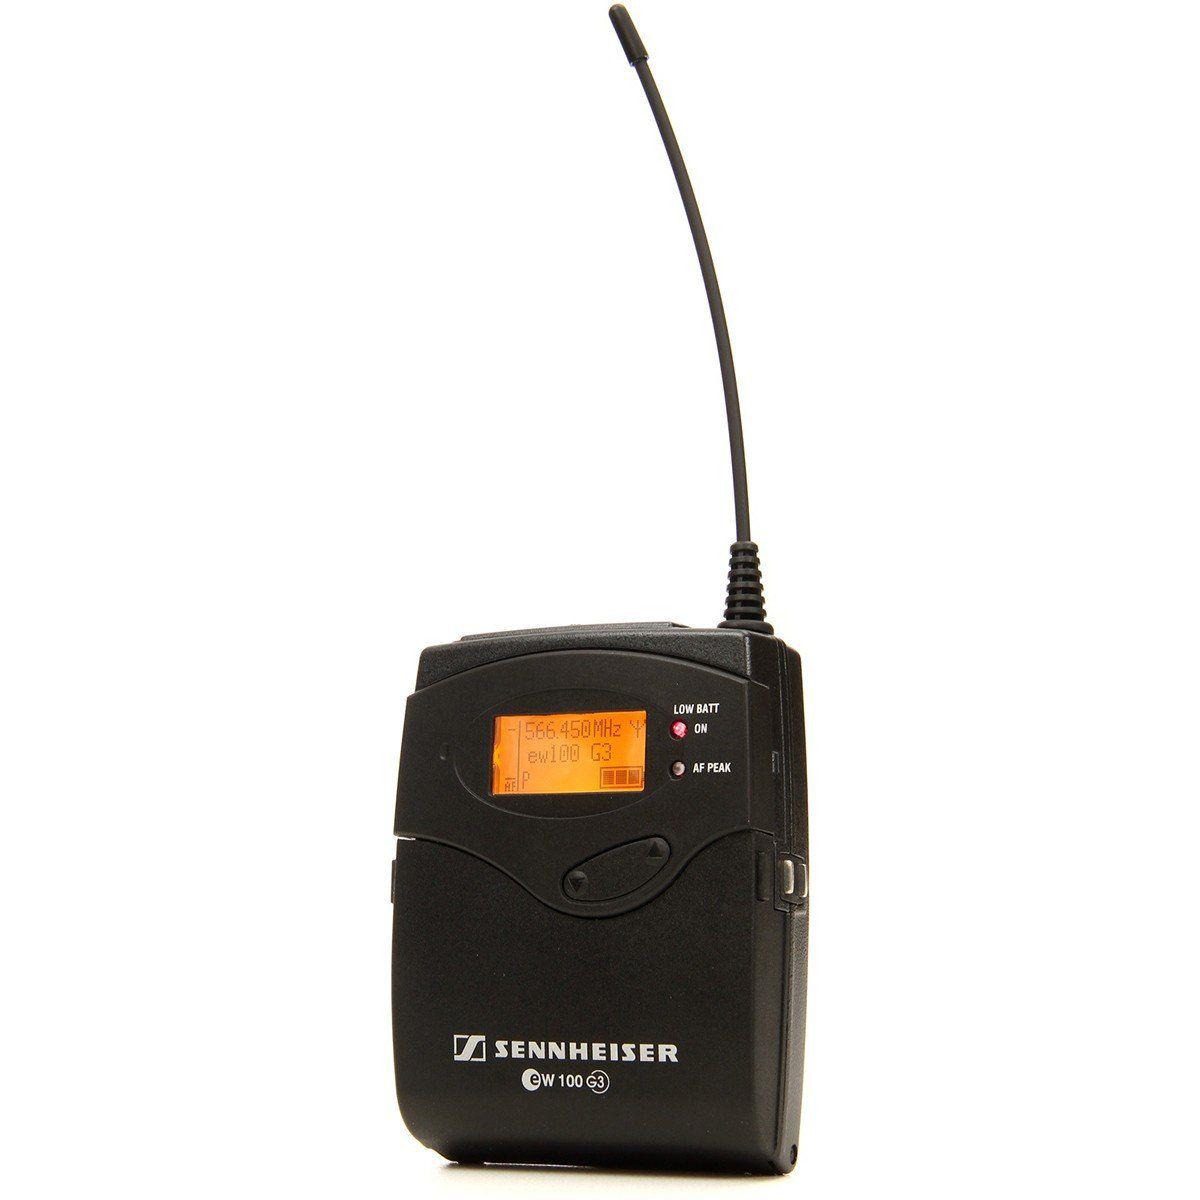 Sennheiser EW112p-G3 Microfone sem fio Sennheiser EW112pg3 para Câmeras